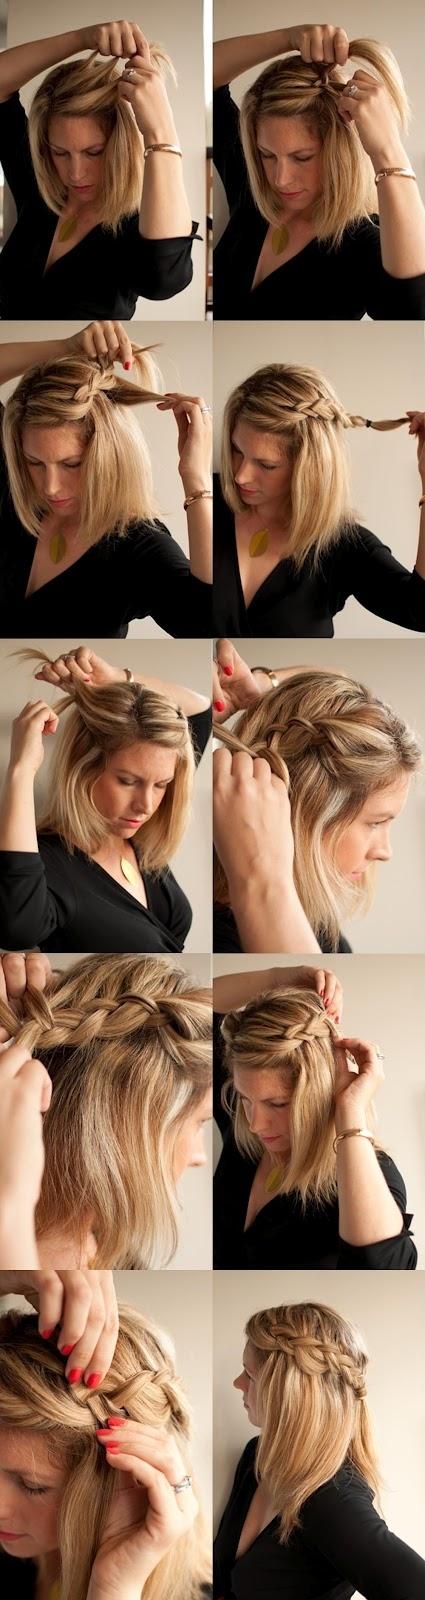 Excellent Braid Tutorials For Medium Length Hair Dpsc Tk Short Hairstyles For Black Women Fulllsitofus